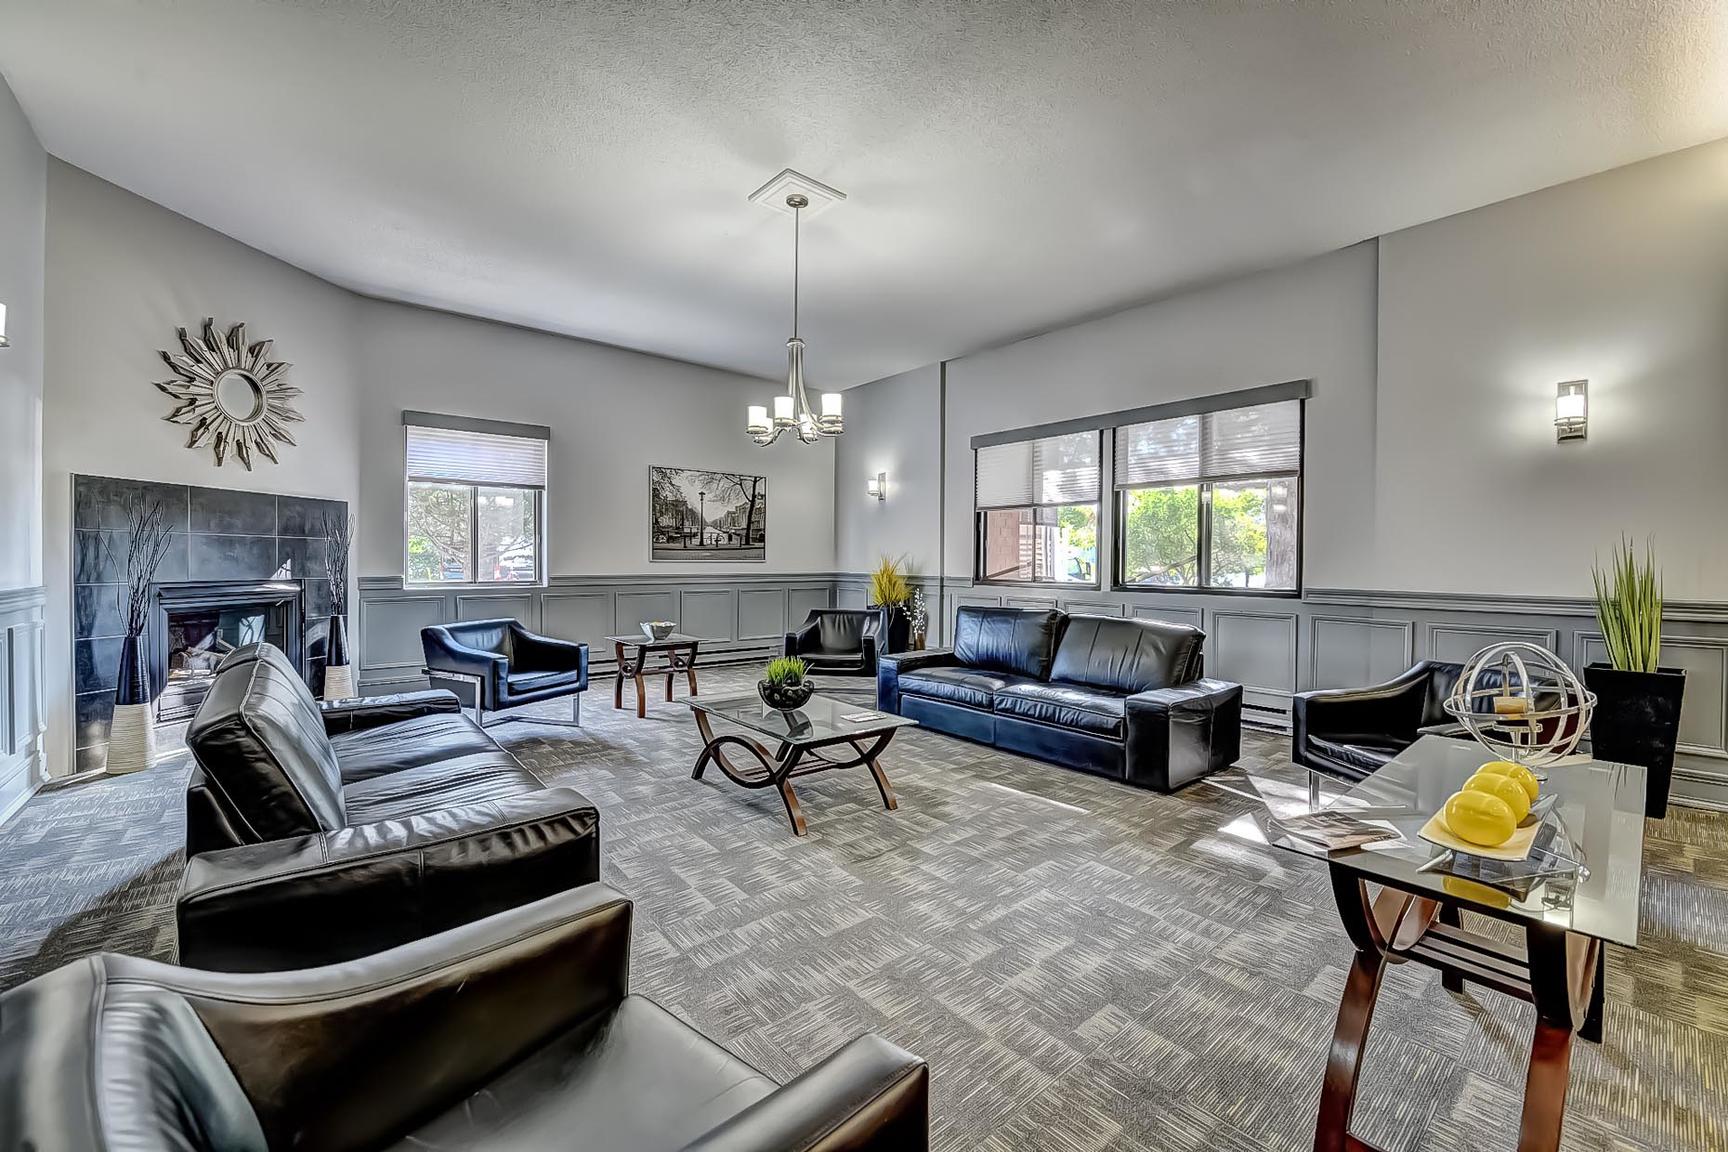 2 bedroom Apartments for rent in Laval at Le Quatre Cent - Photo 23 - RentQuebecApartments – L407185